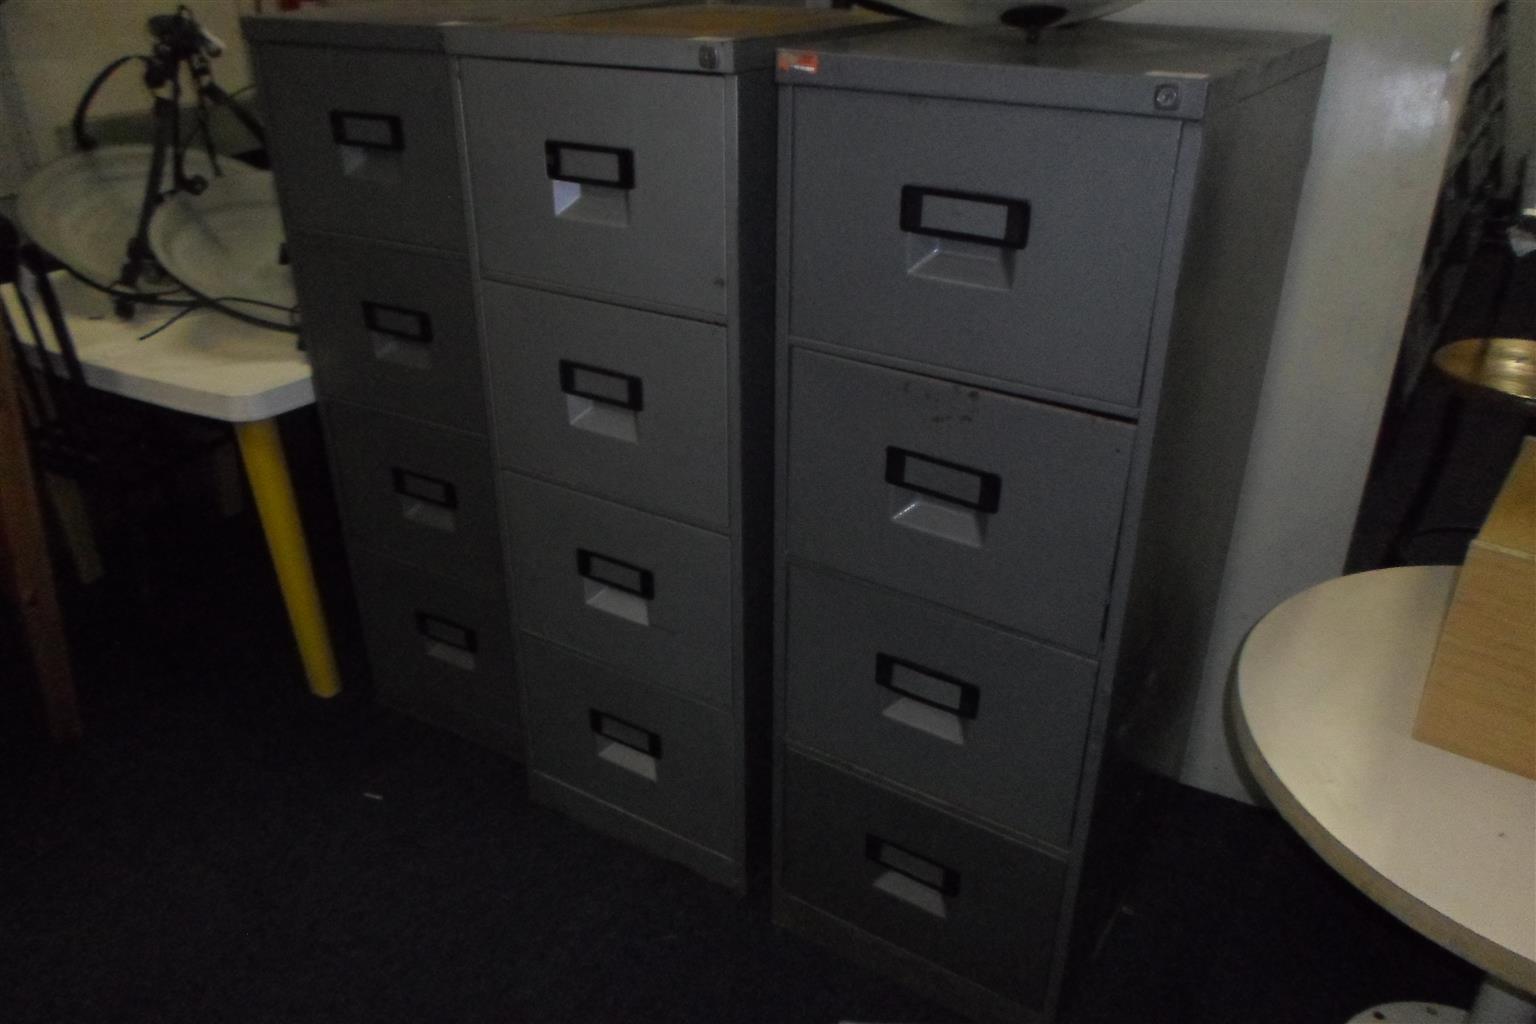 4 Drawer Steel Cabinet - B033043962-14-16